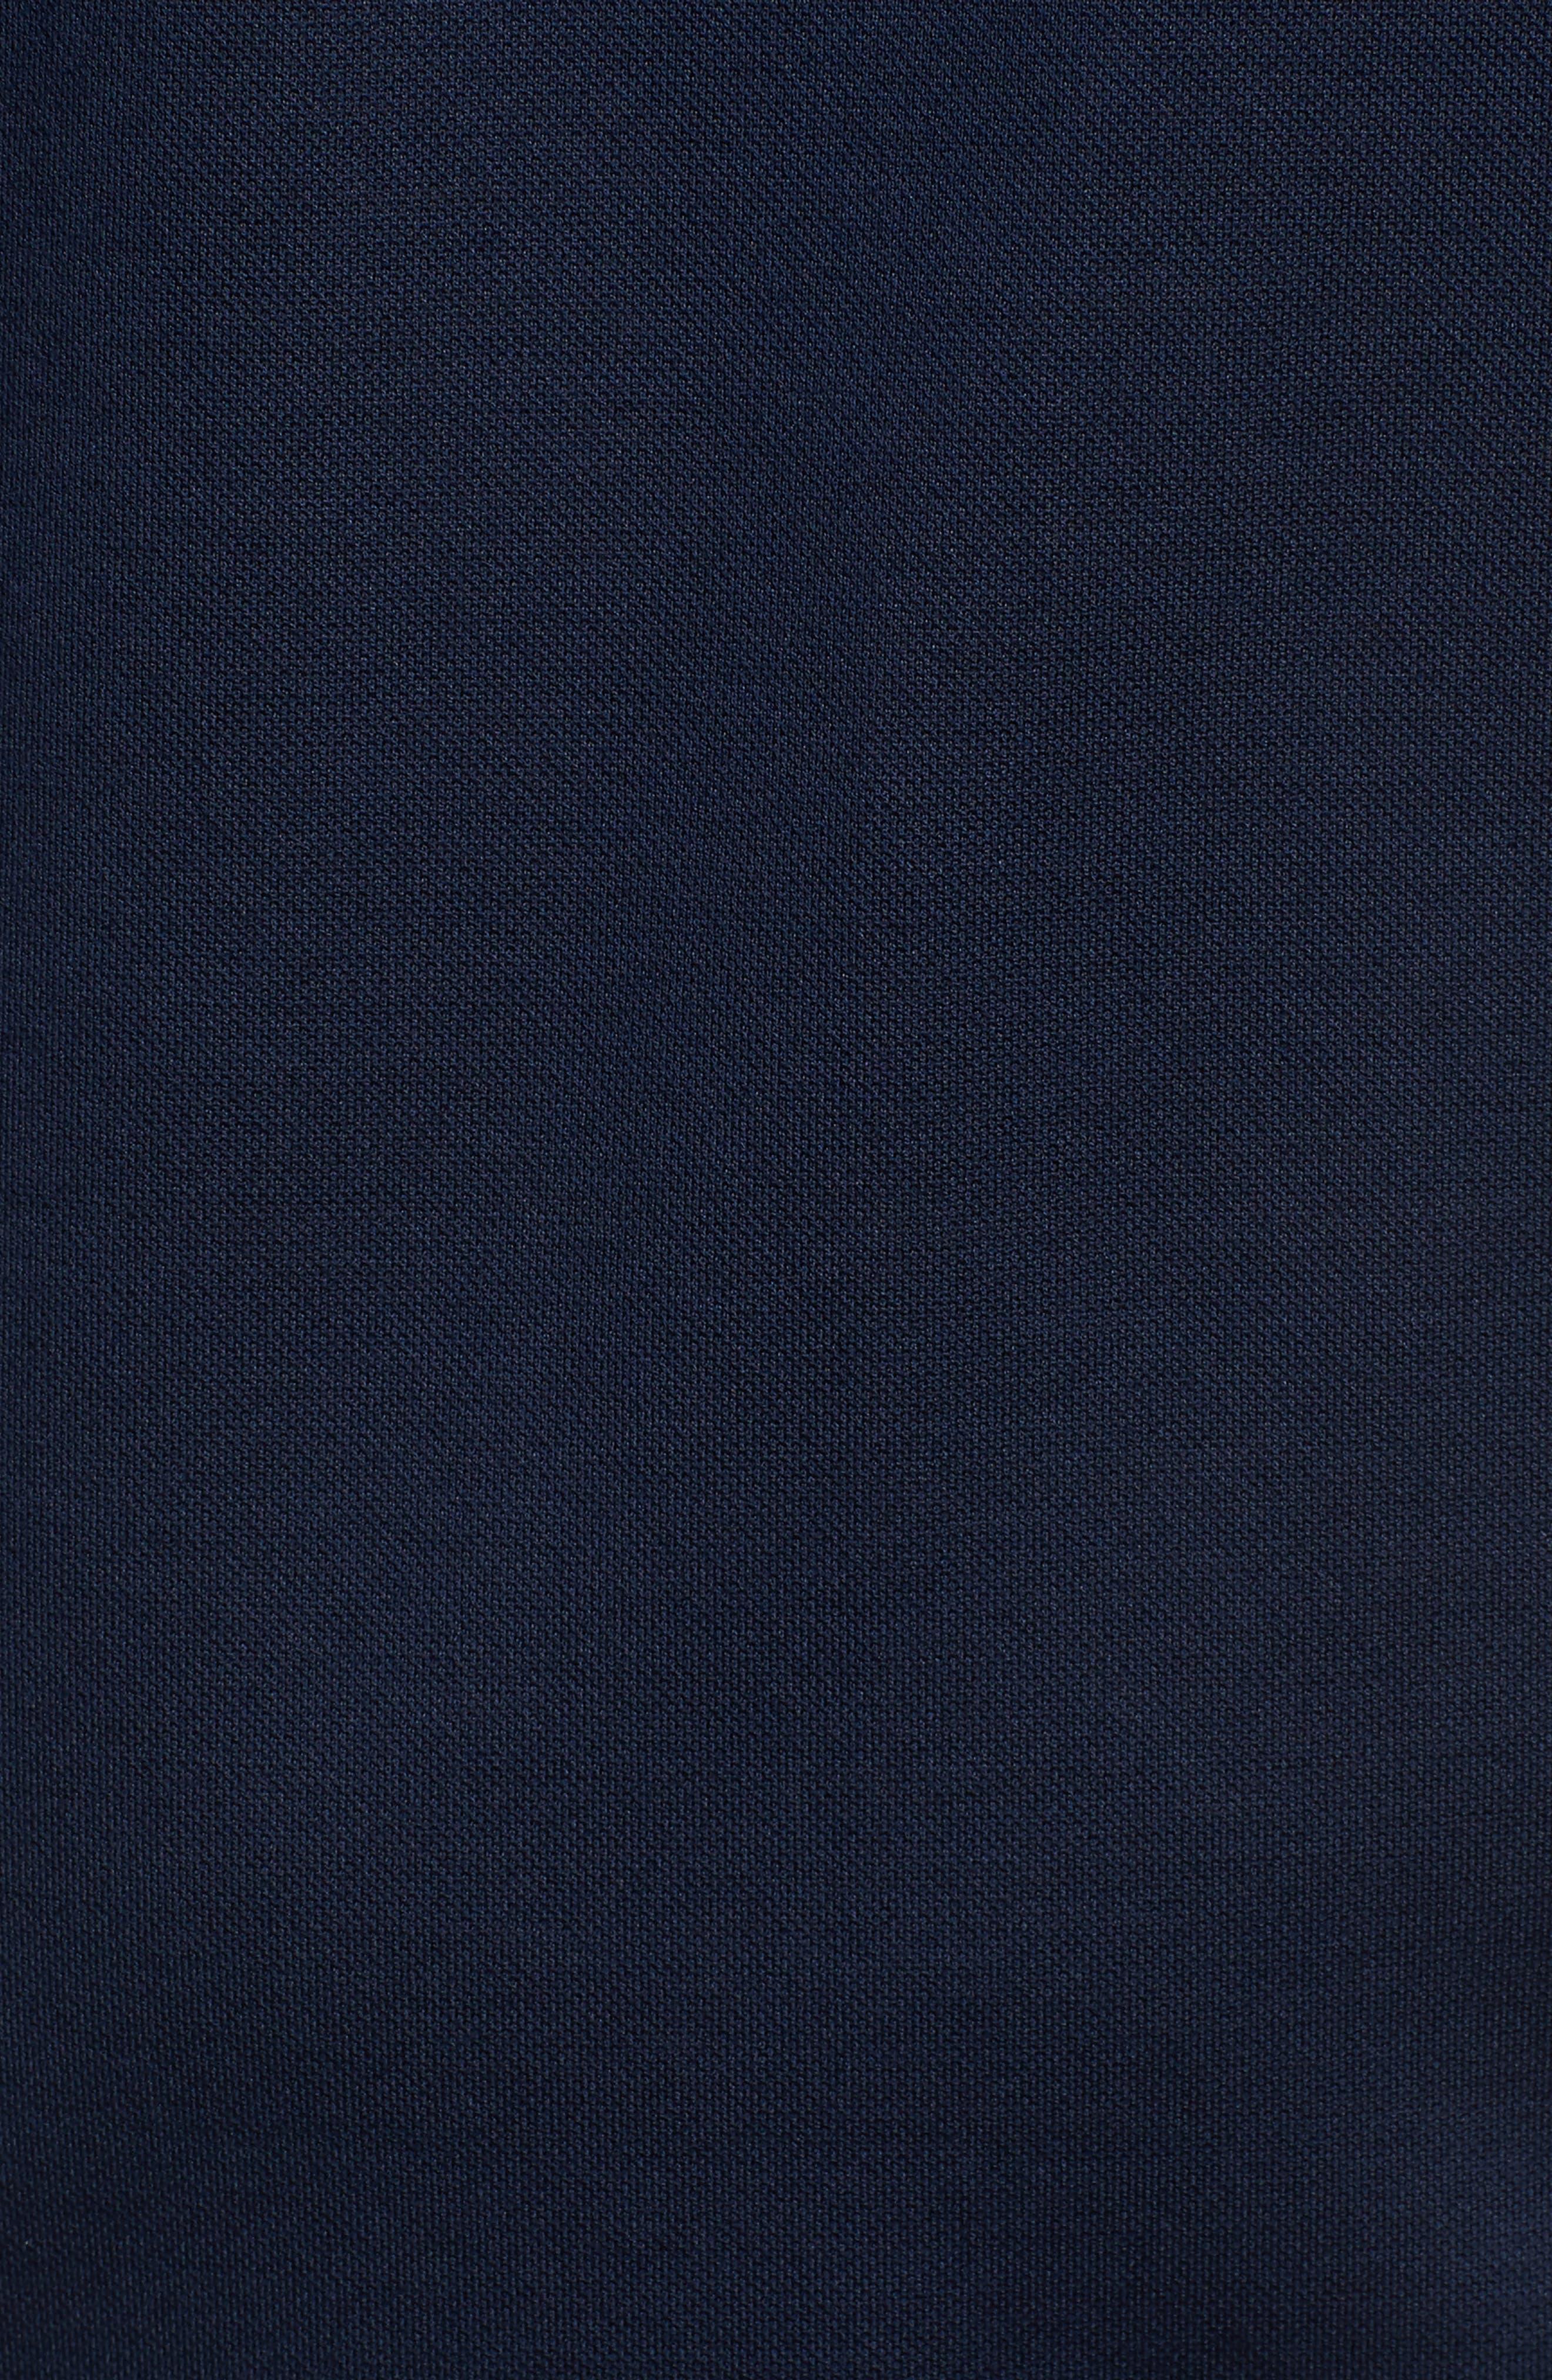 Paul&Shark Stripe Trim Piqué Polo,                             Alternate thumbnail 5, color,                             400